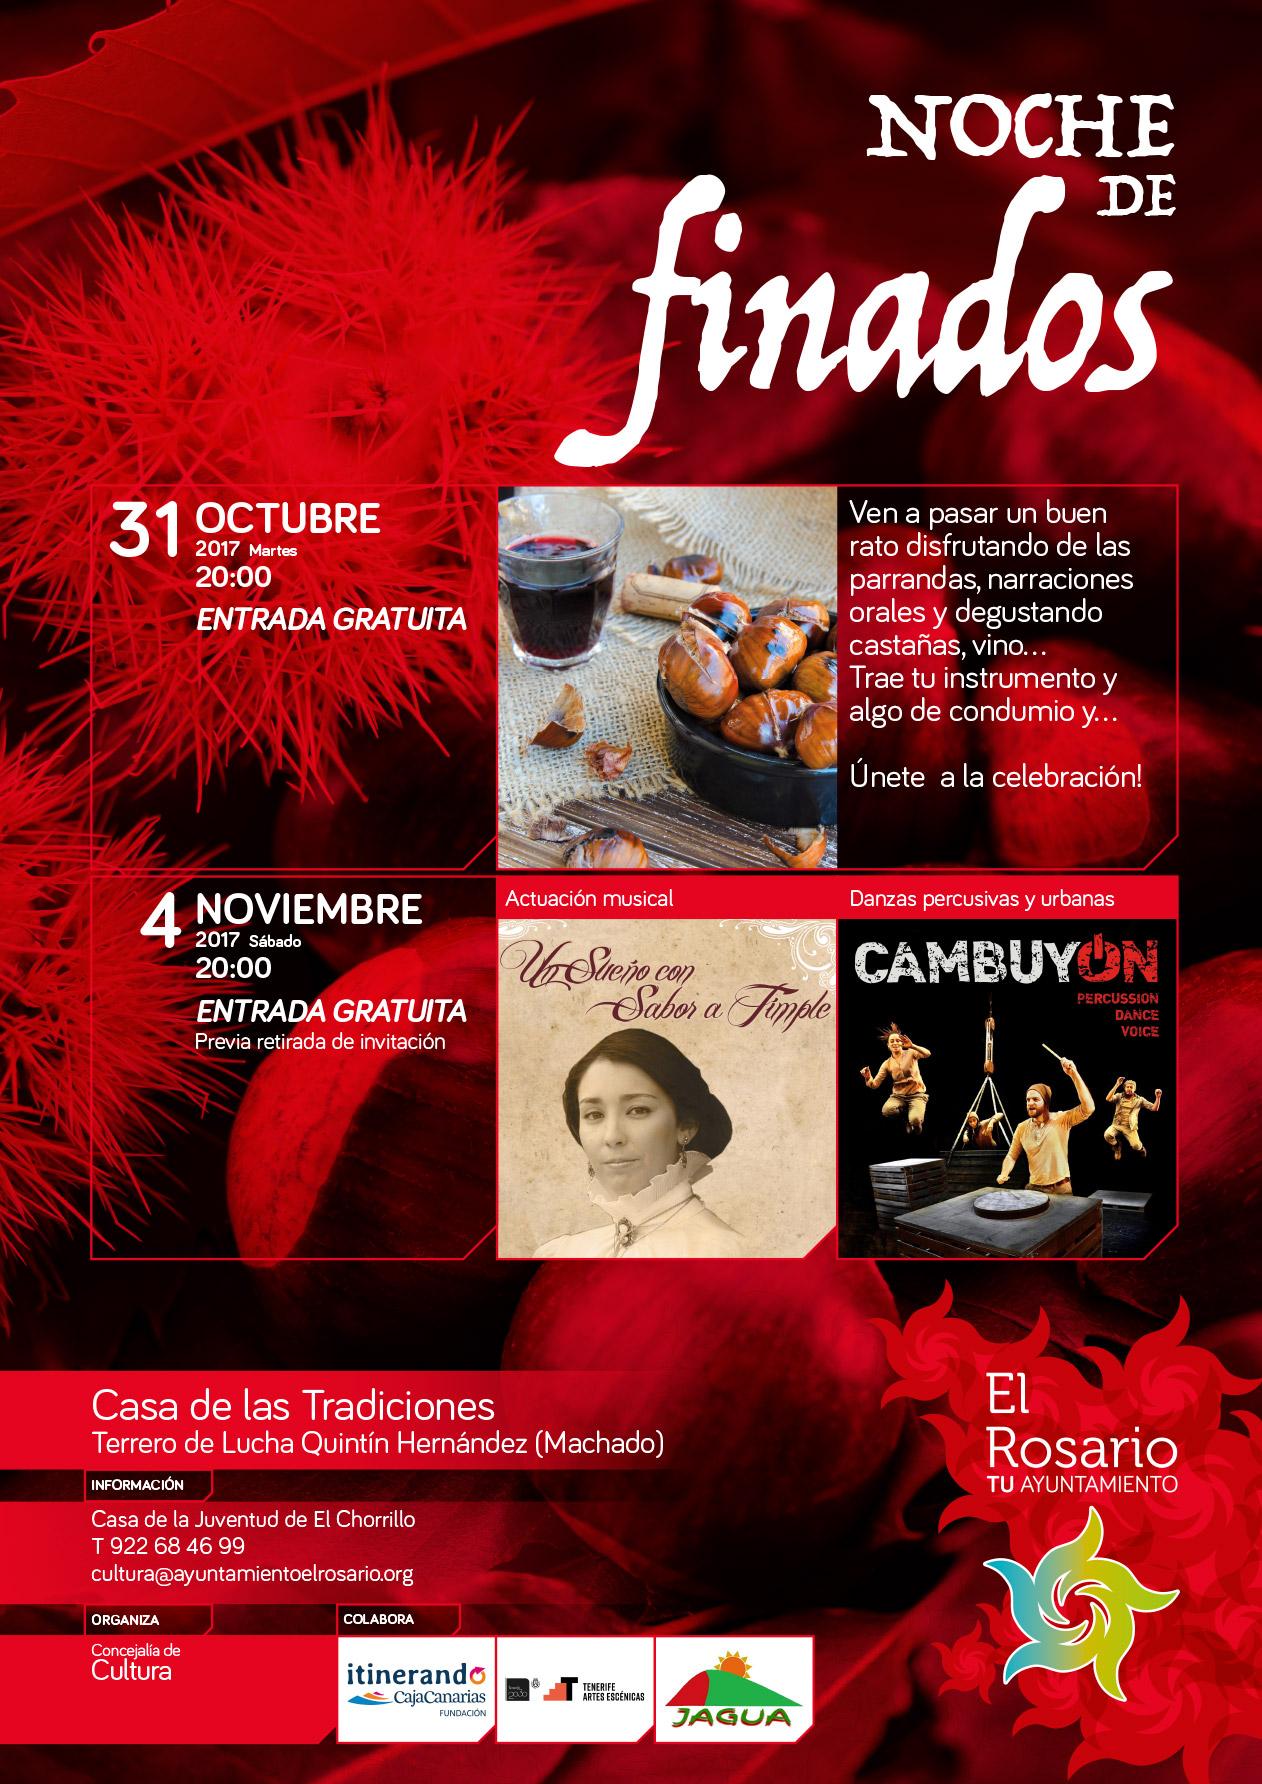 DIA DE FINADOS-20171031-CARTEL-01af-redes